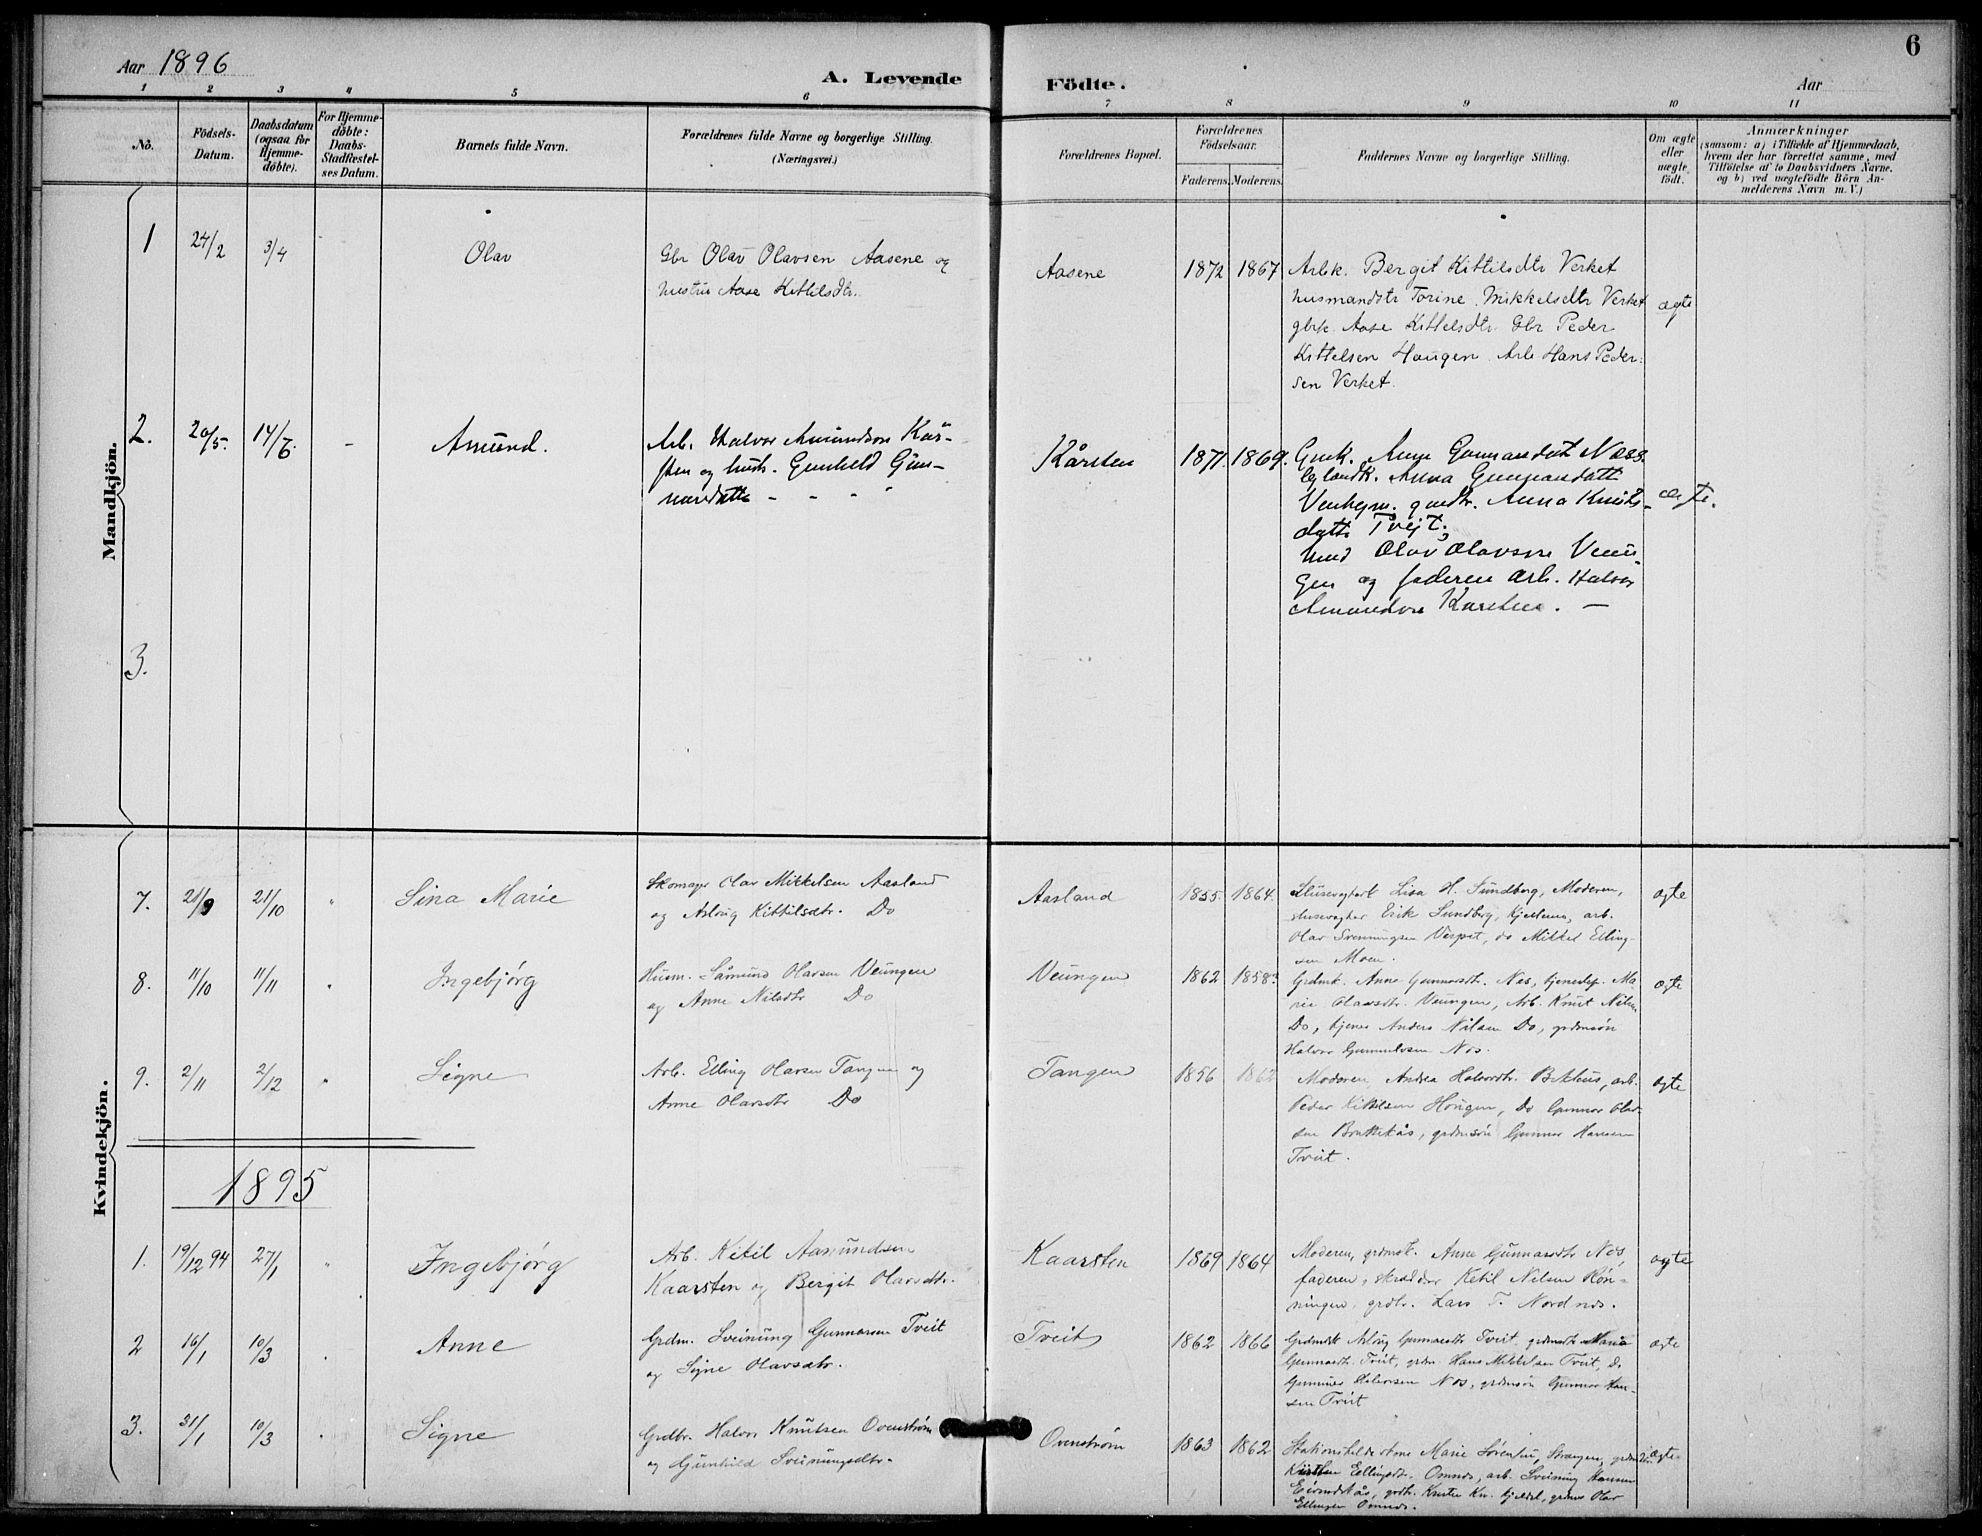 SAKO, Lunde kirkebøker, F/Fb/L0004: Ministerialbok nr. II 4, 1892-1907, s. 6